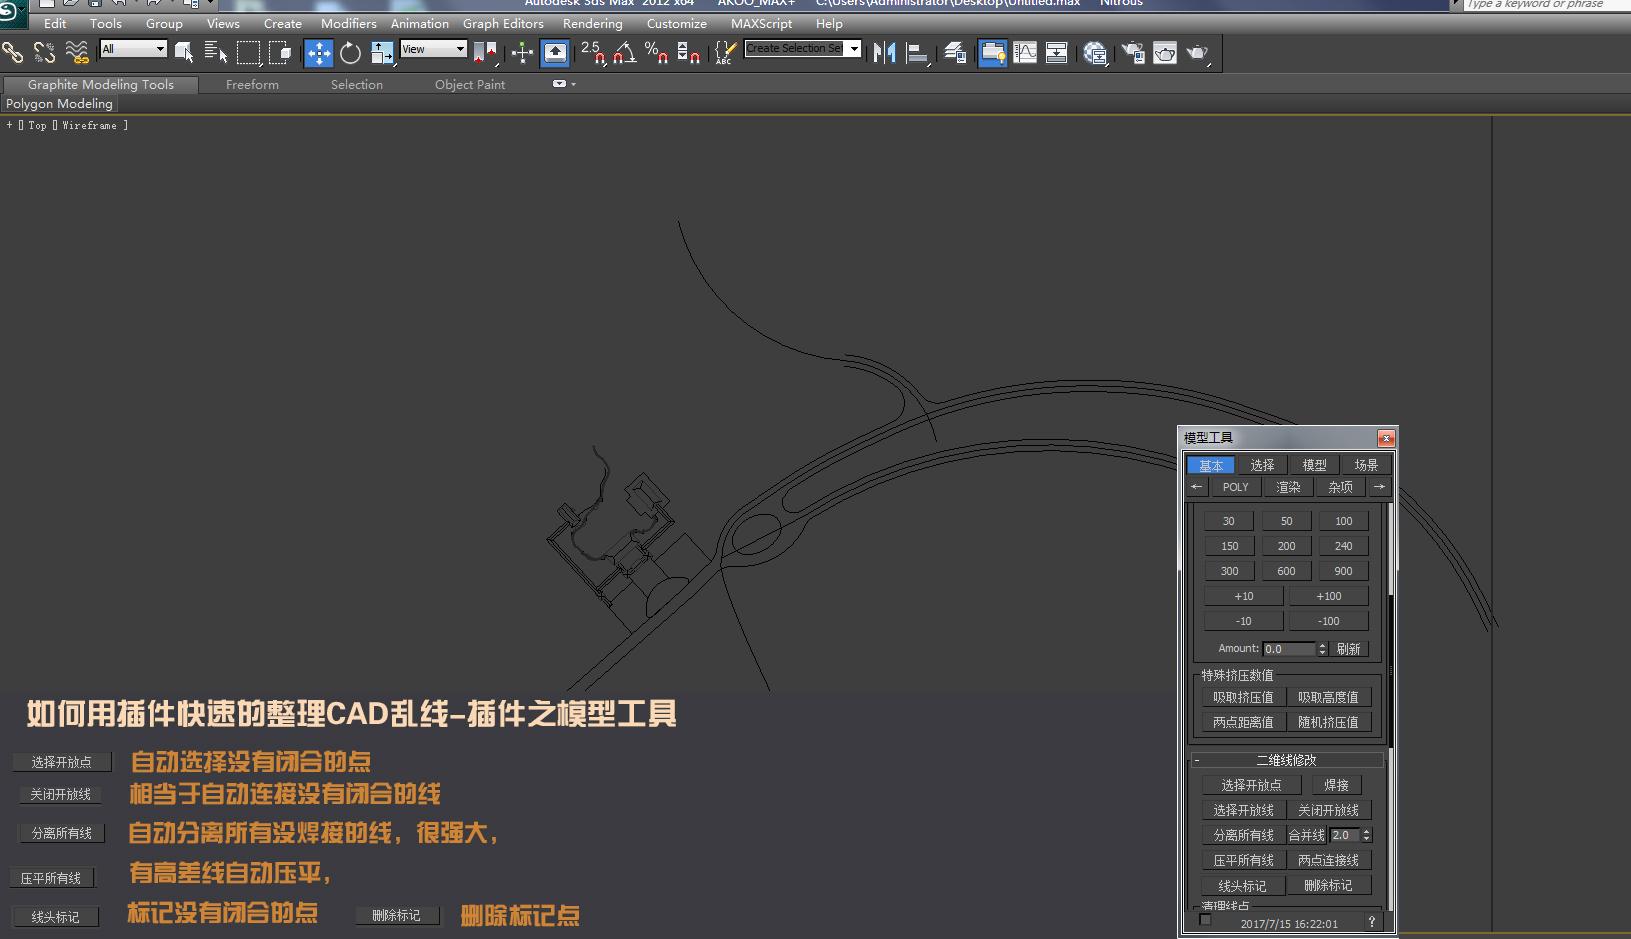 3DMAX如何快速的運用cad線畫出地形-地形檢查插件